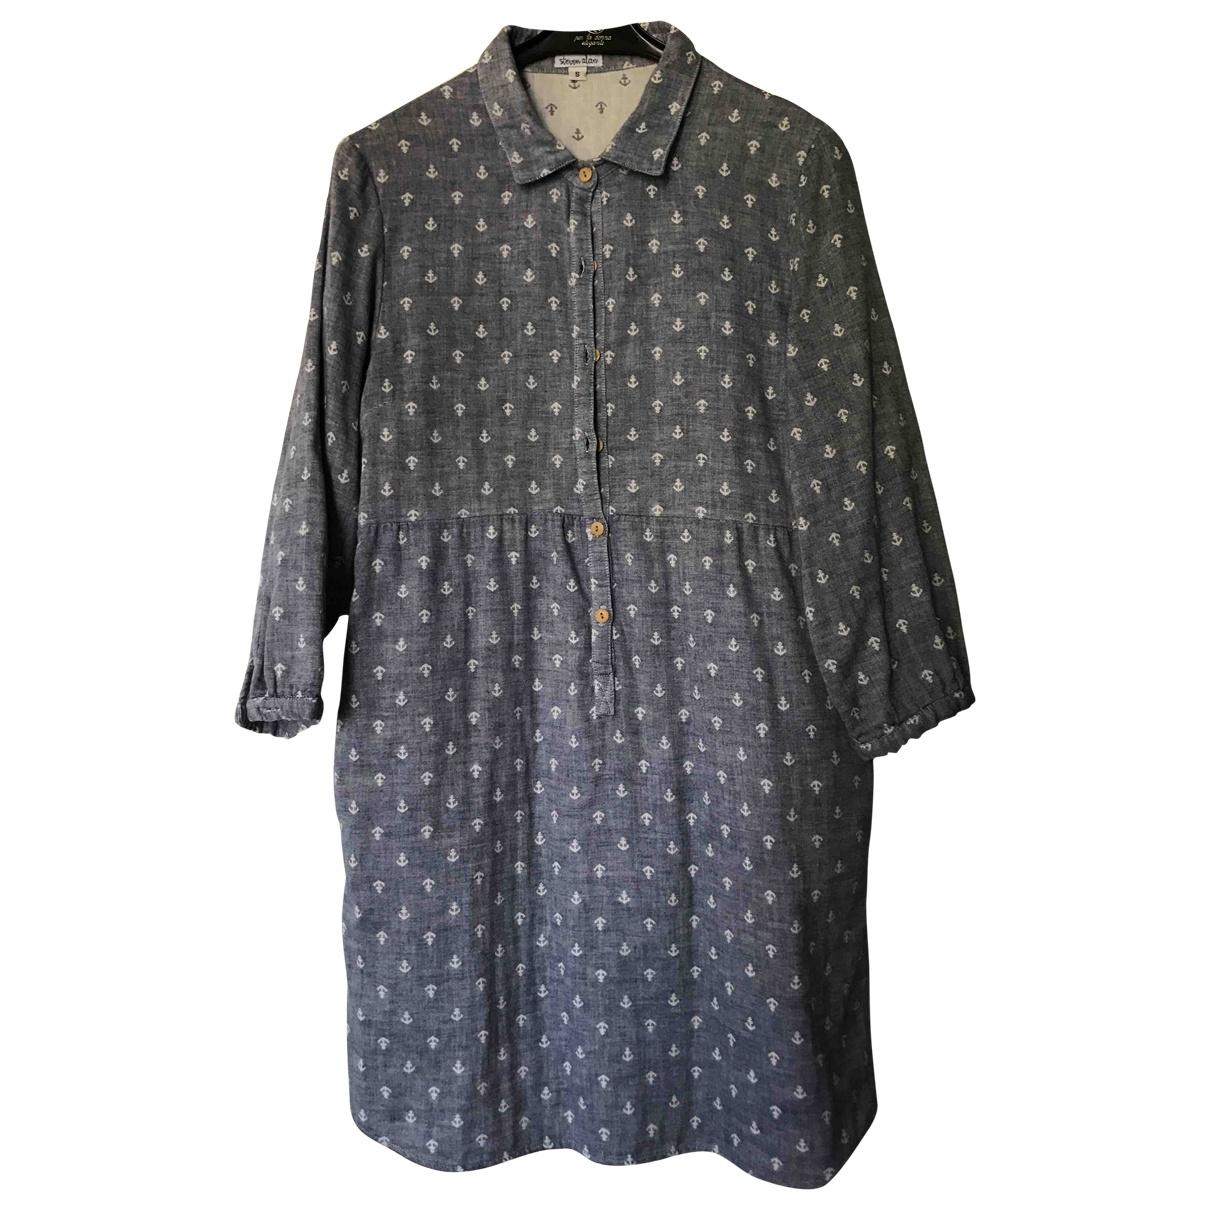 Steven Alan \N Blue Cotton dress for Women S International